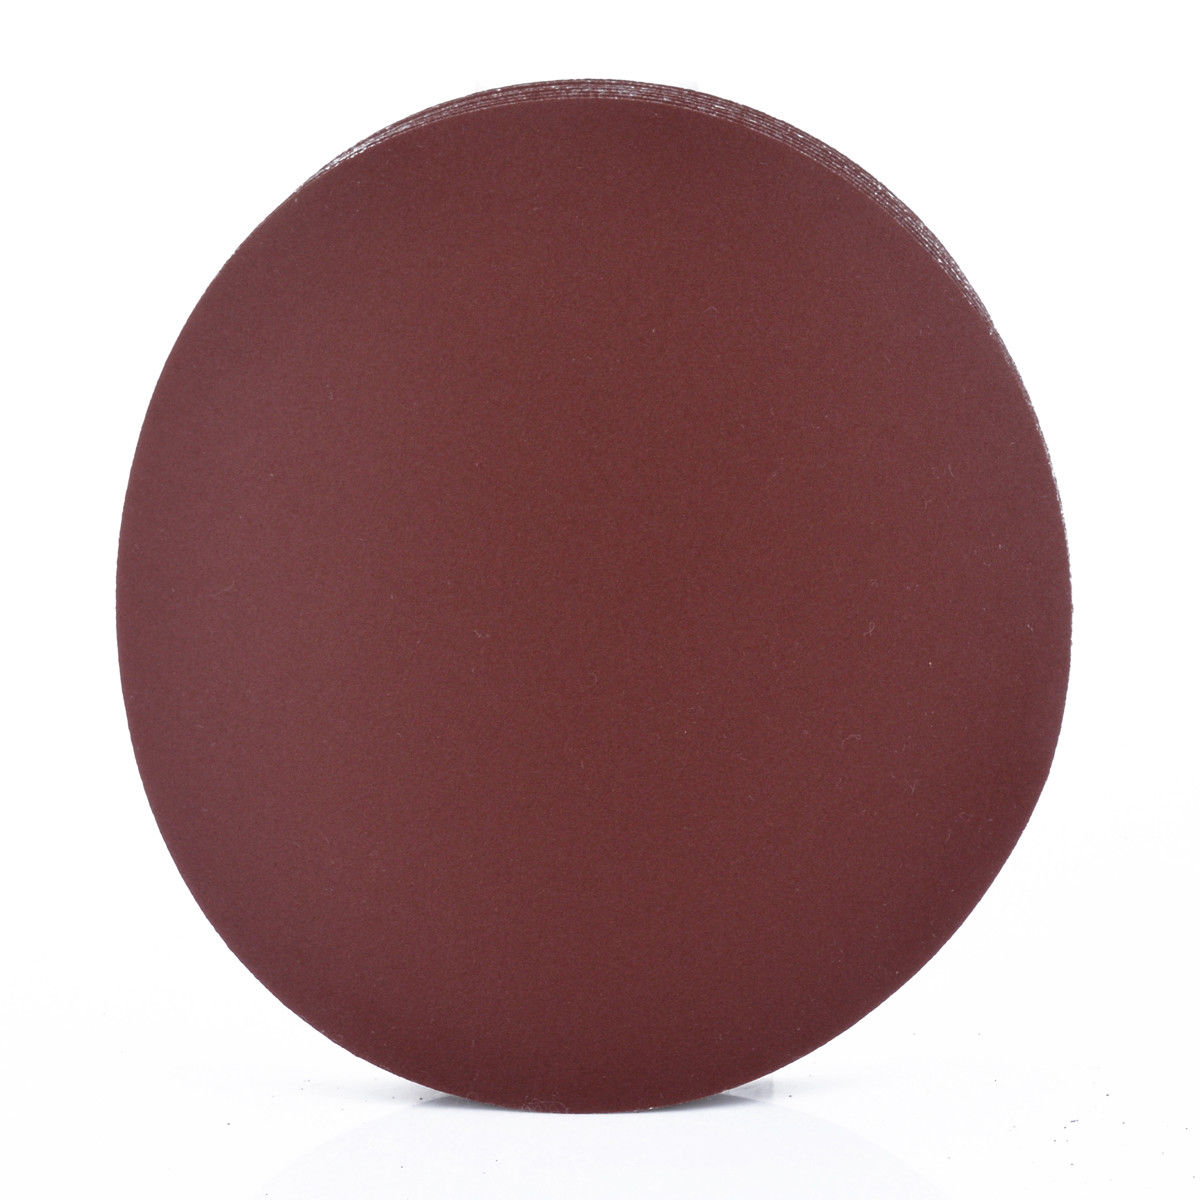 100pcs 1/'/' inch 30mm 3000 Grit Sander Disc Sanding Polishing Pad Sandpaper NL